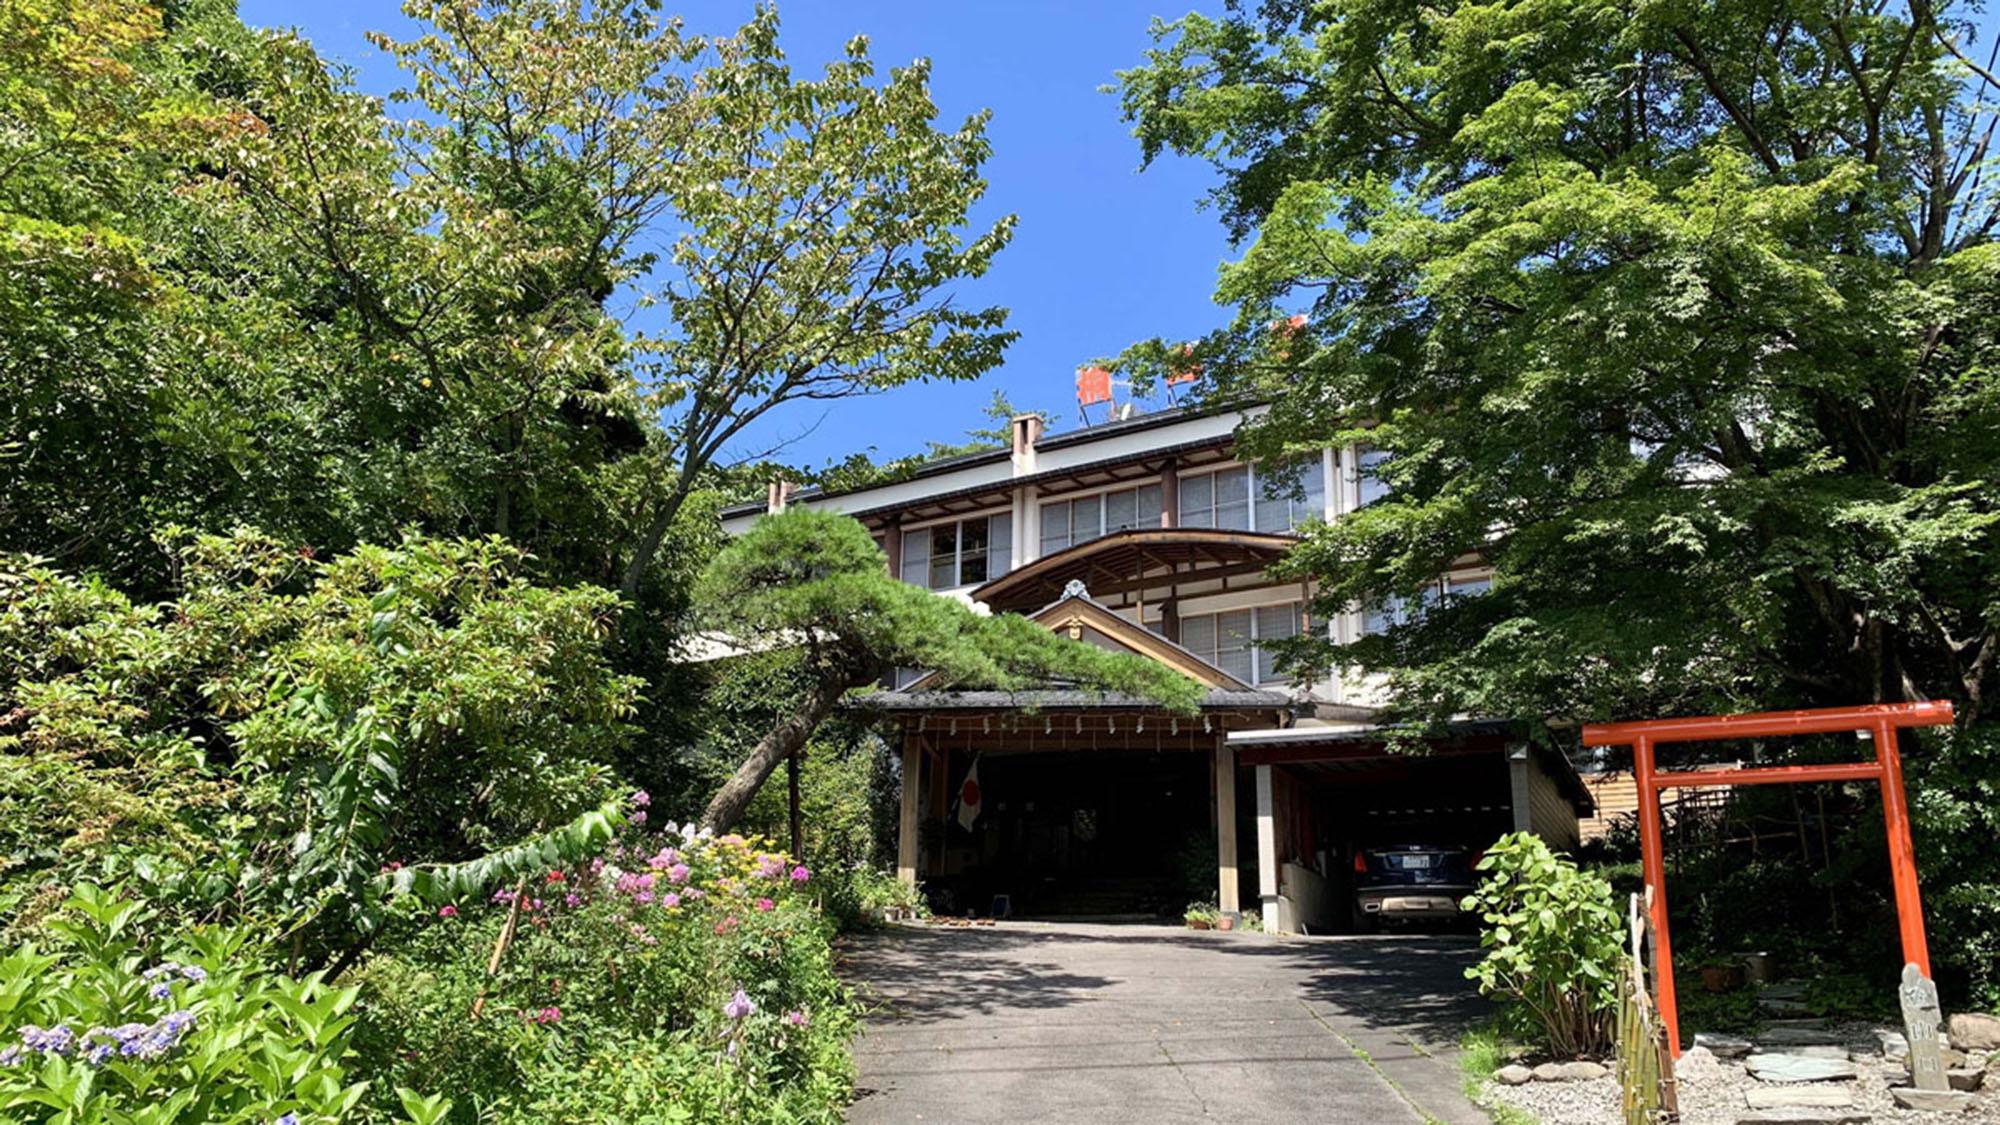 草津温泉 尻焼き風呂の桐島屋旅館